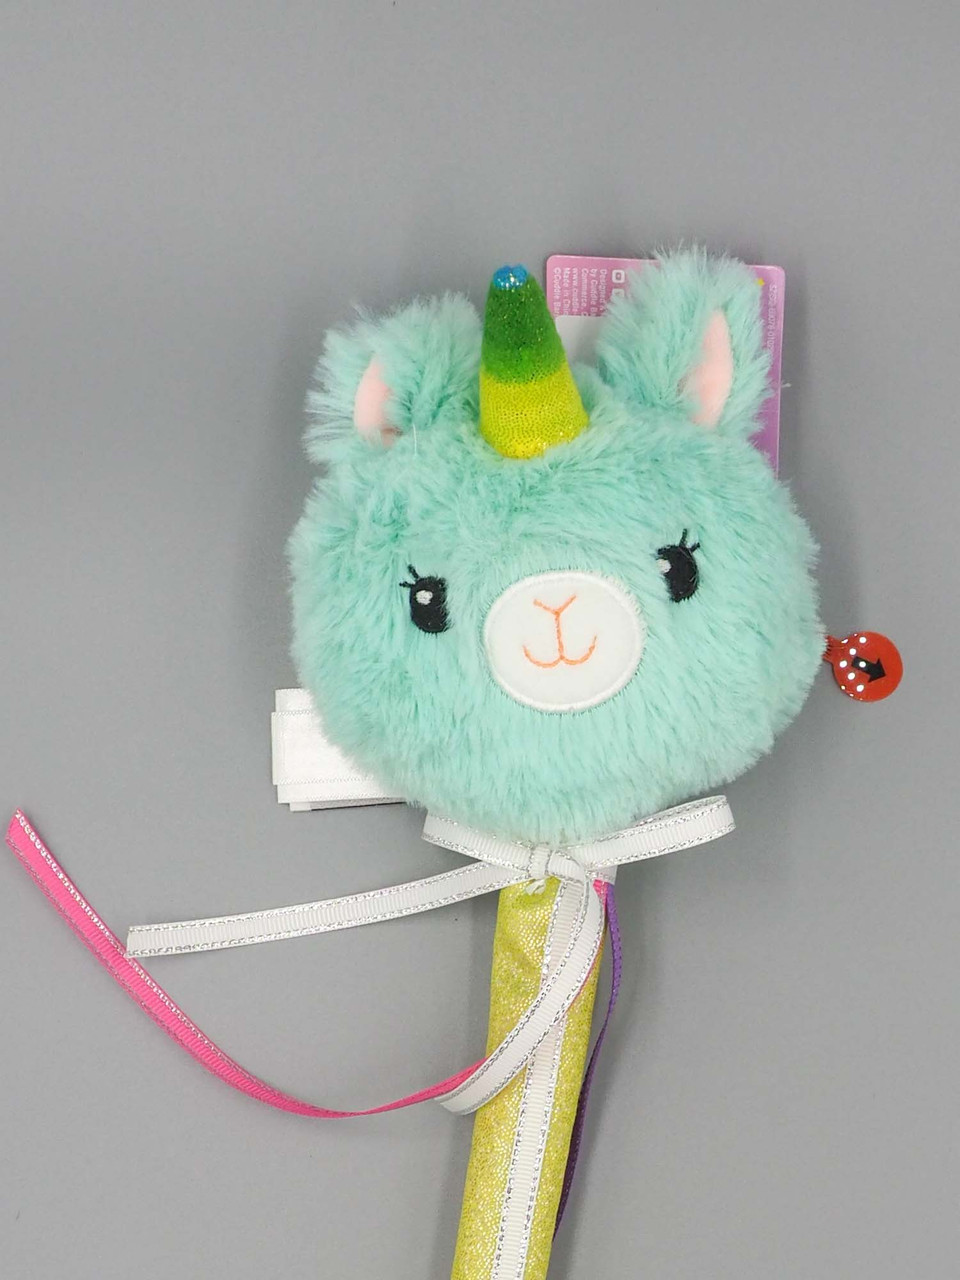 teal enchanted musical wand cuddle barn